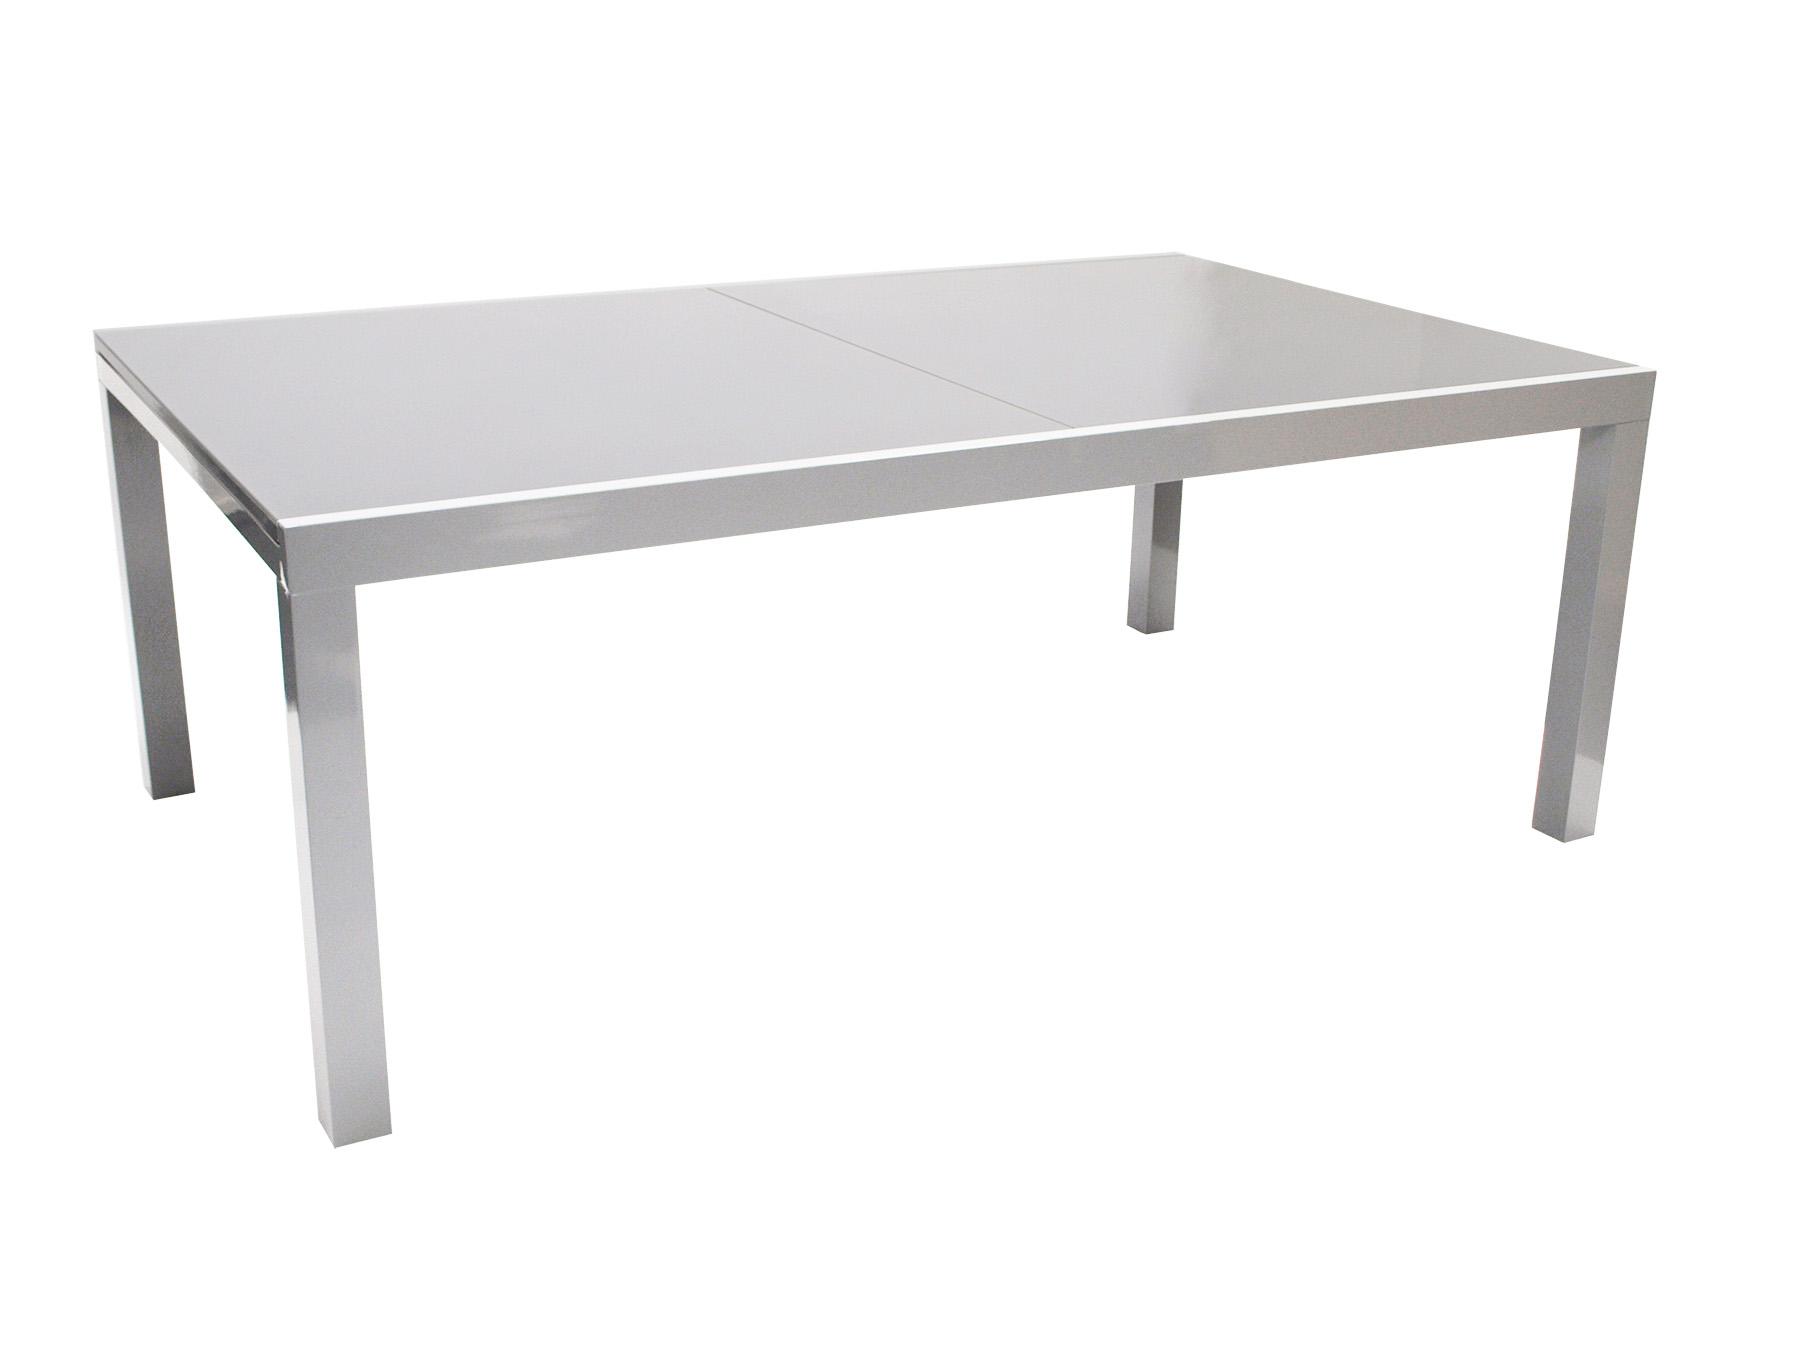 Ausziehtisch MARINA 200/300x110cm, Aluminium + Glas grau